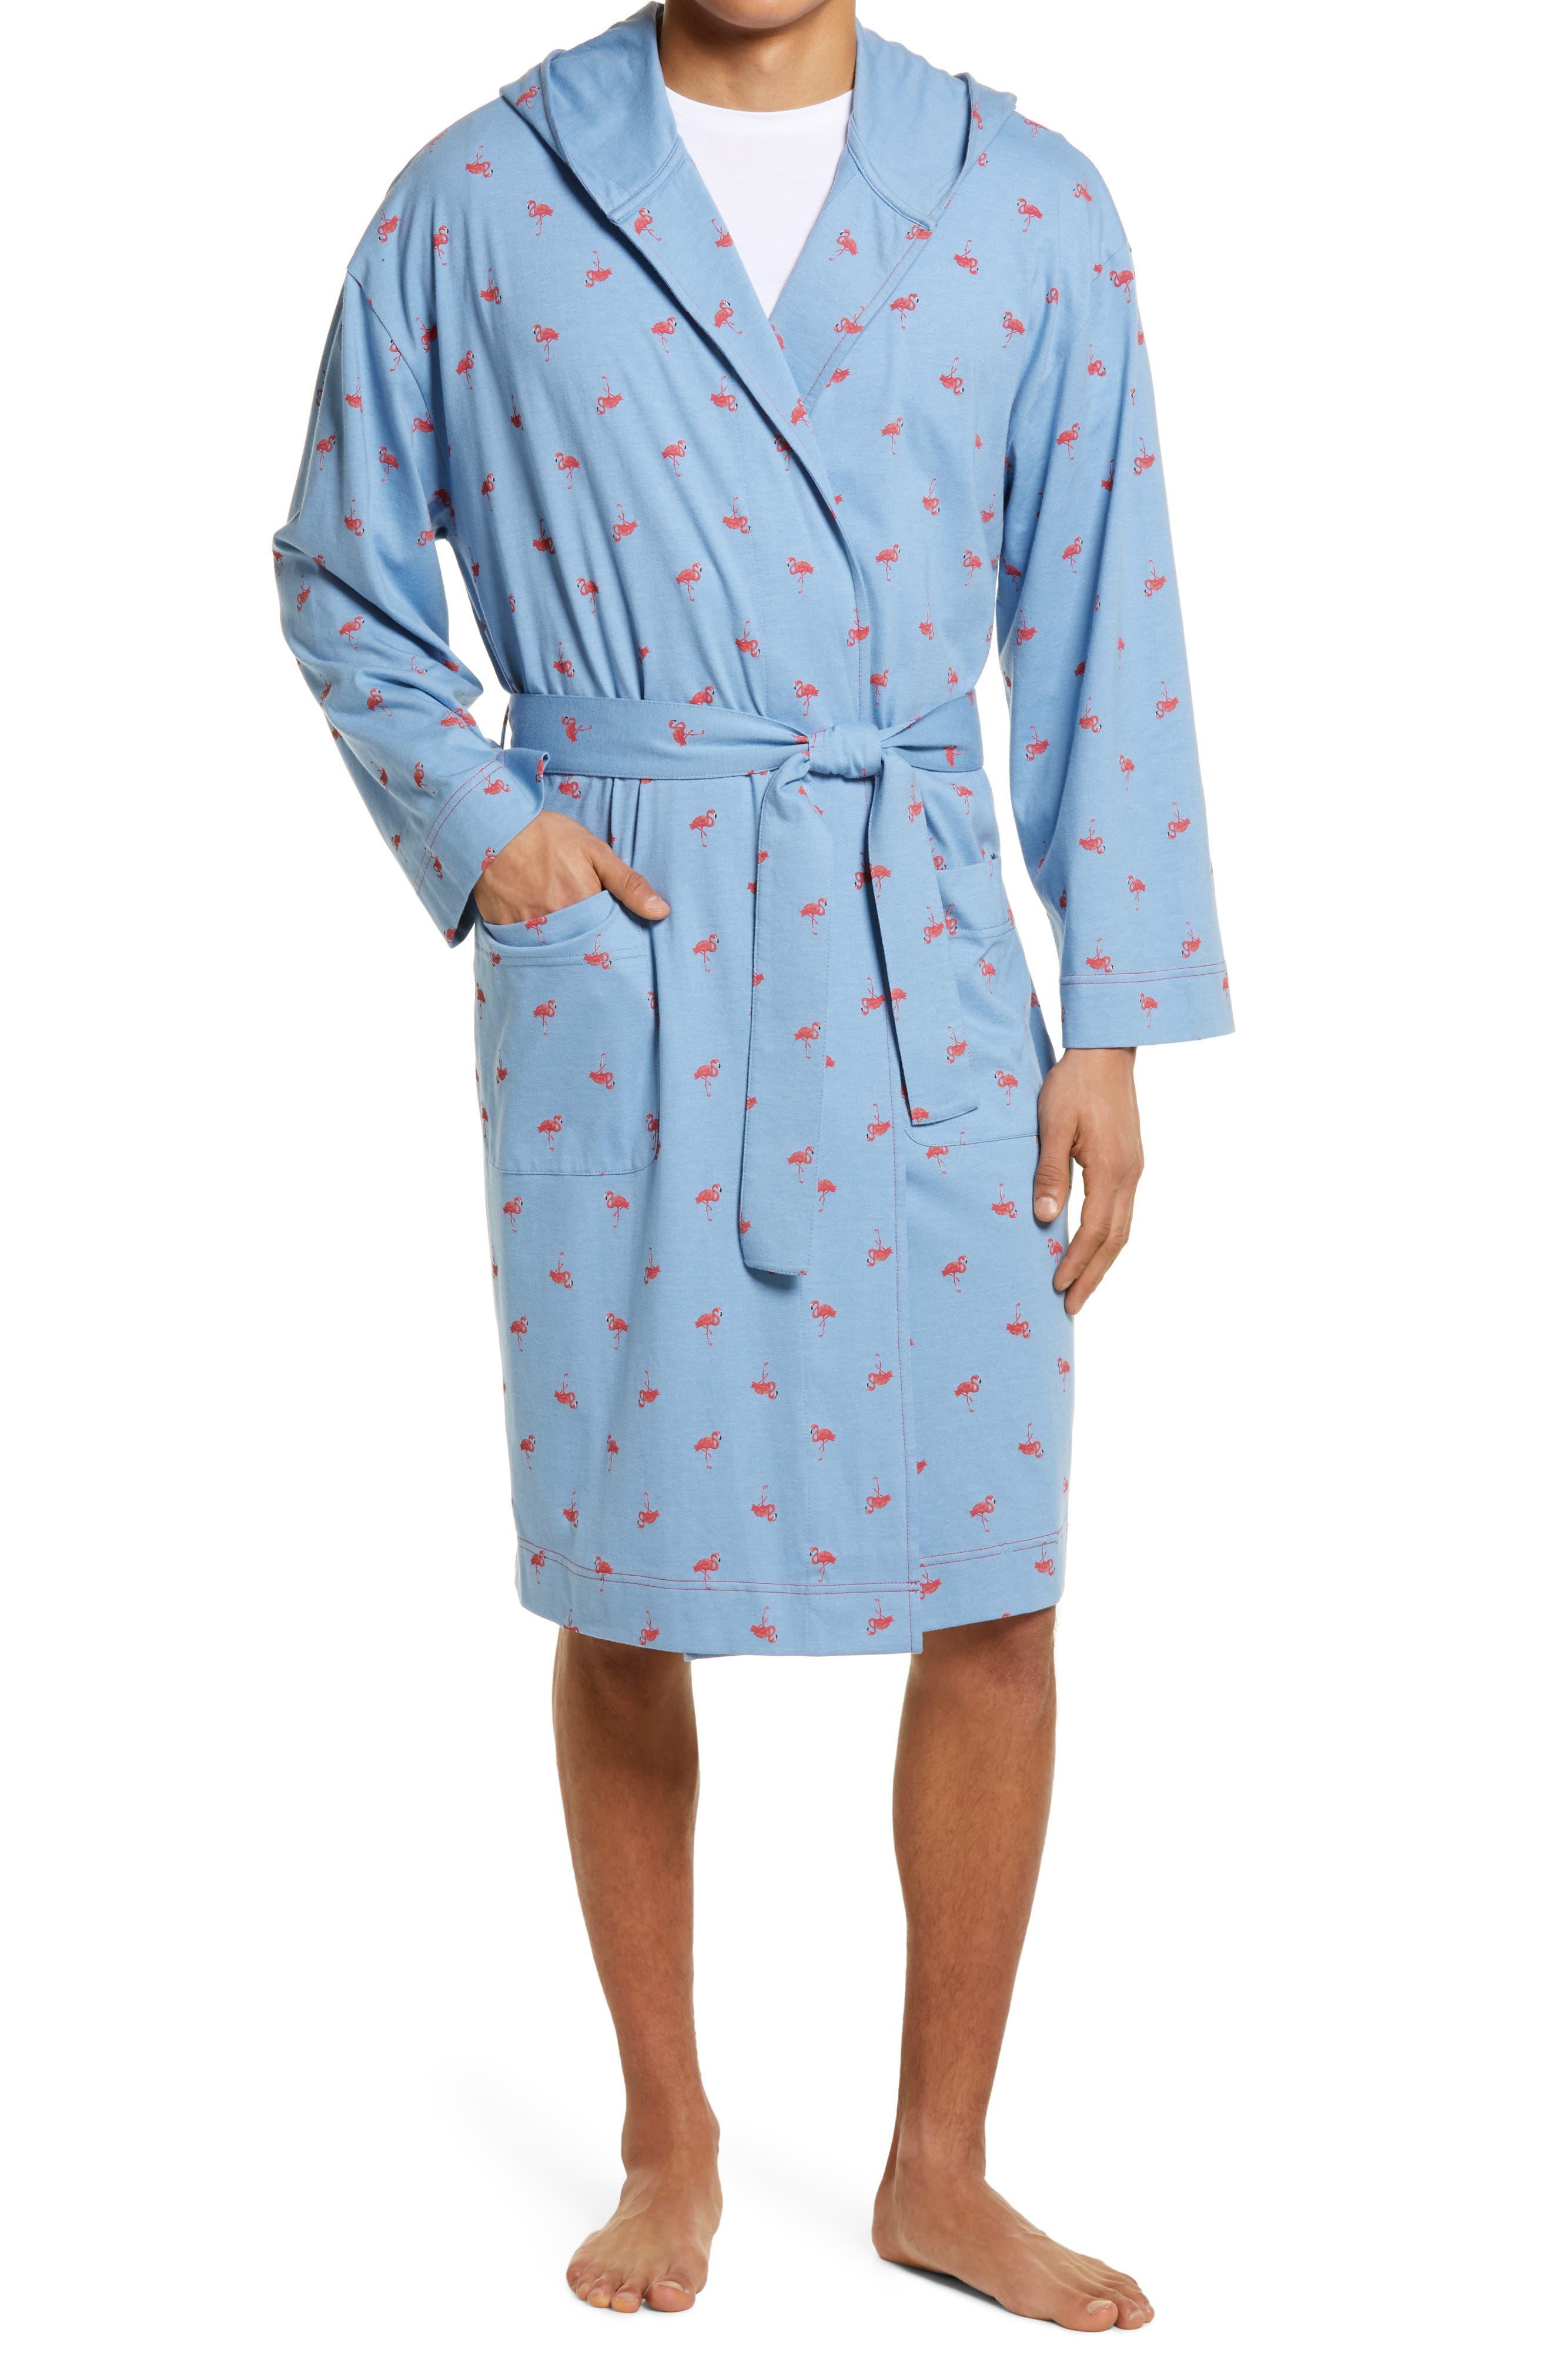 Del Sol Hooded Robe